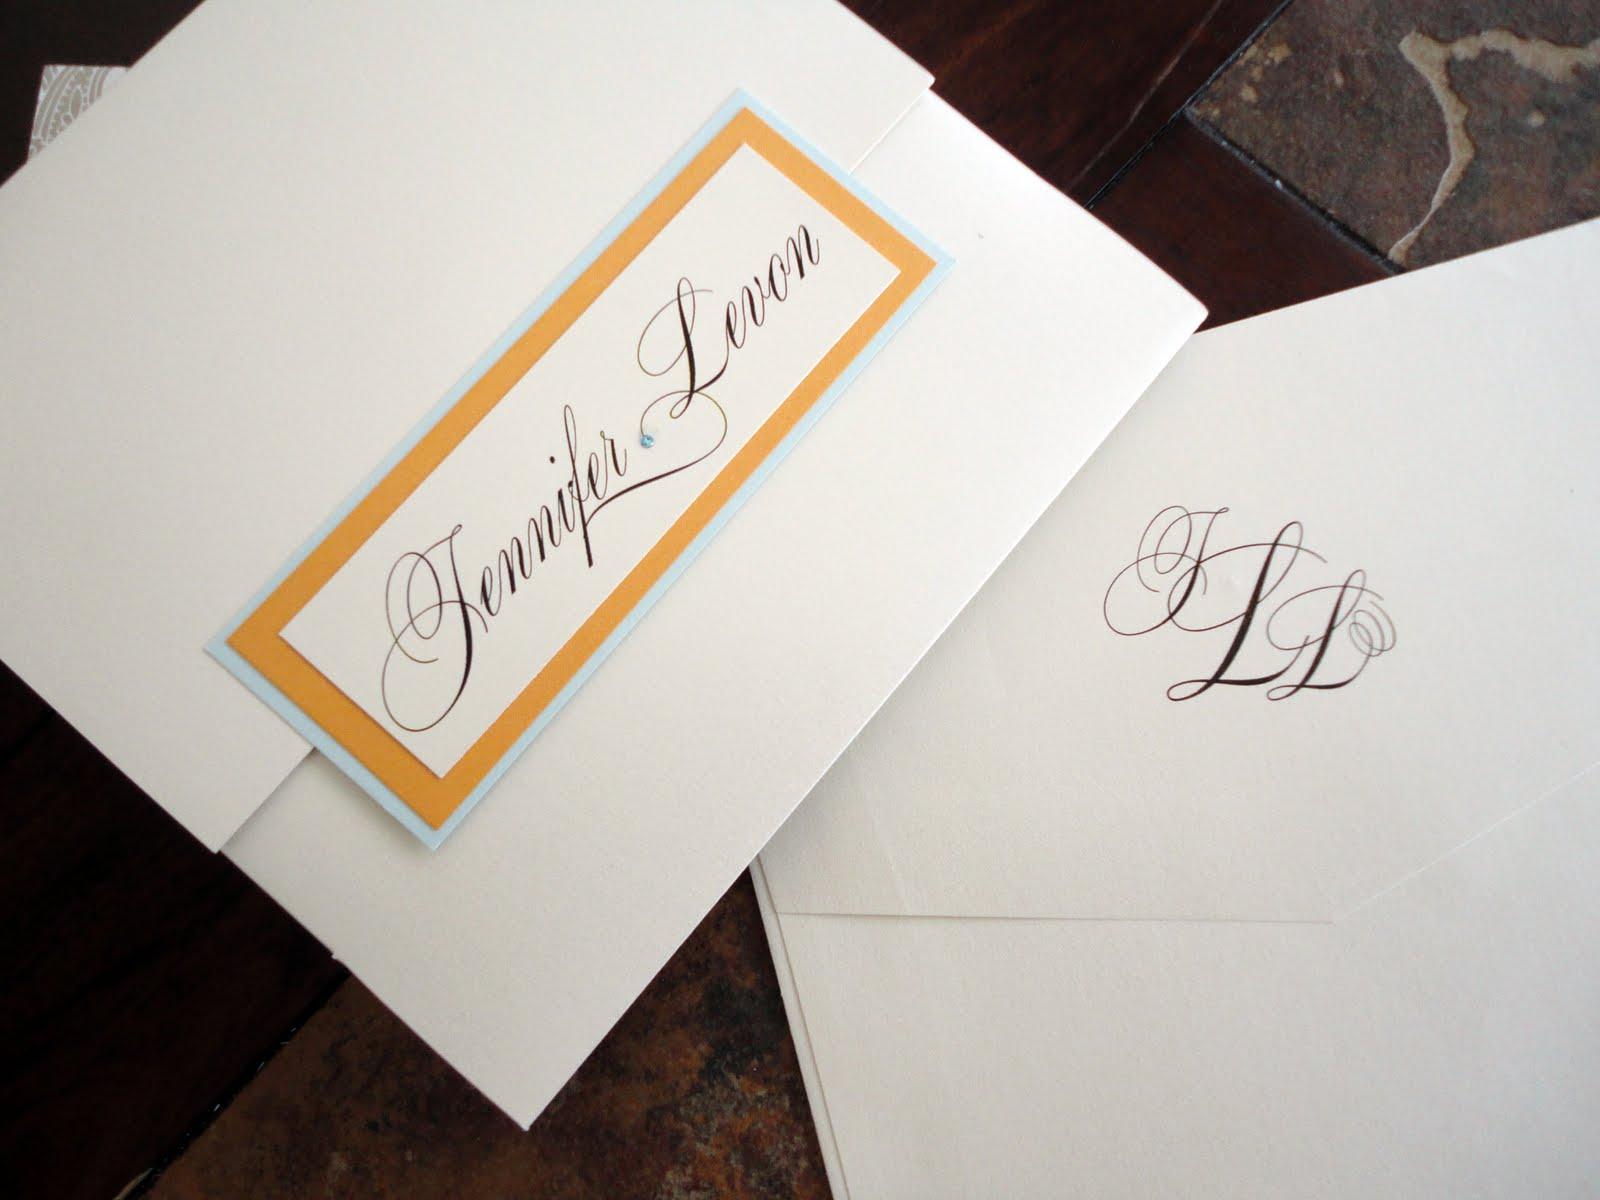 Pocket invitations baltimore kindly rsvp designs blog pocket invitations baltimore wedding invitations baltimore stopboris Image collections